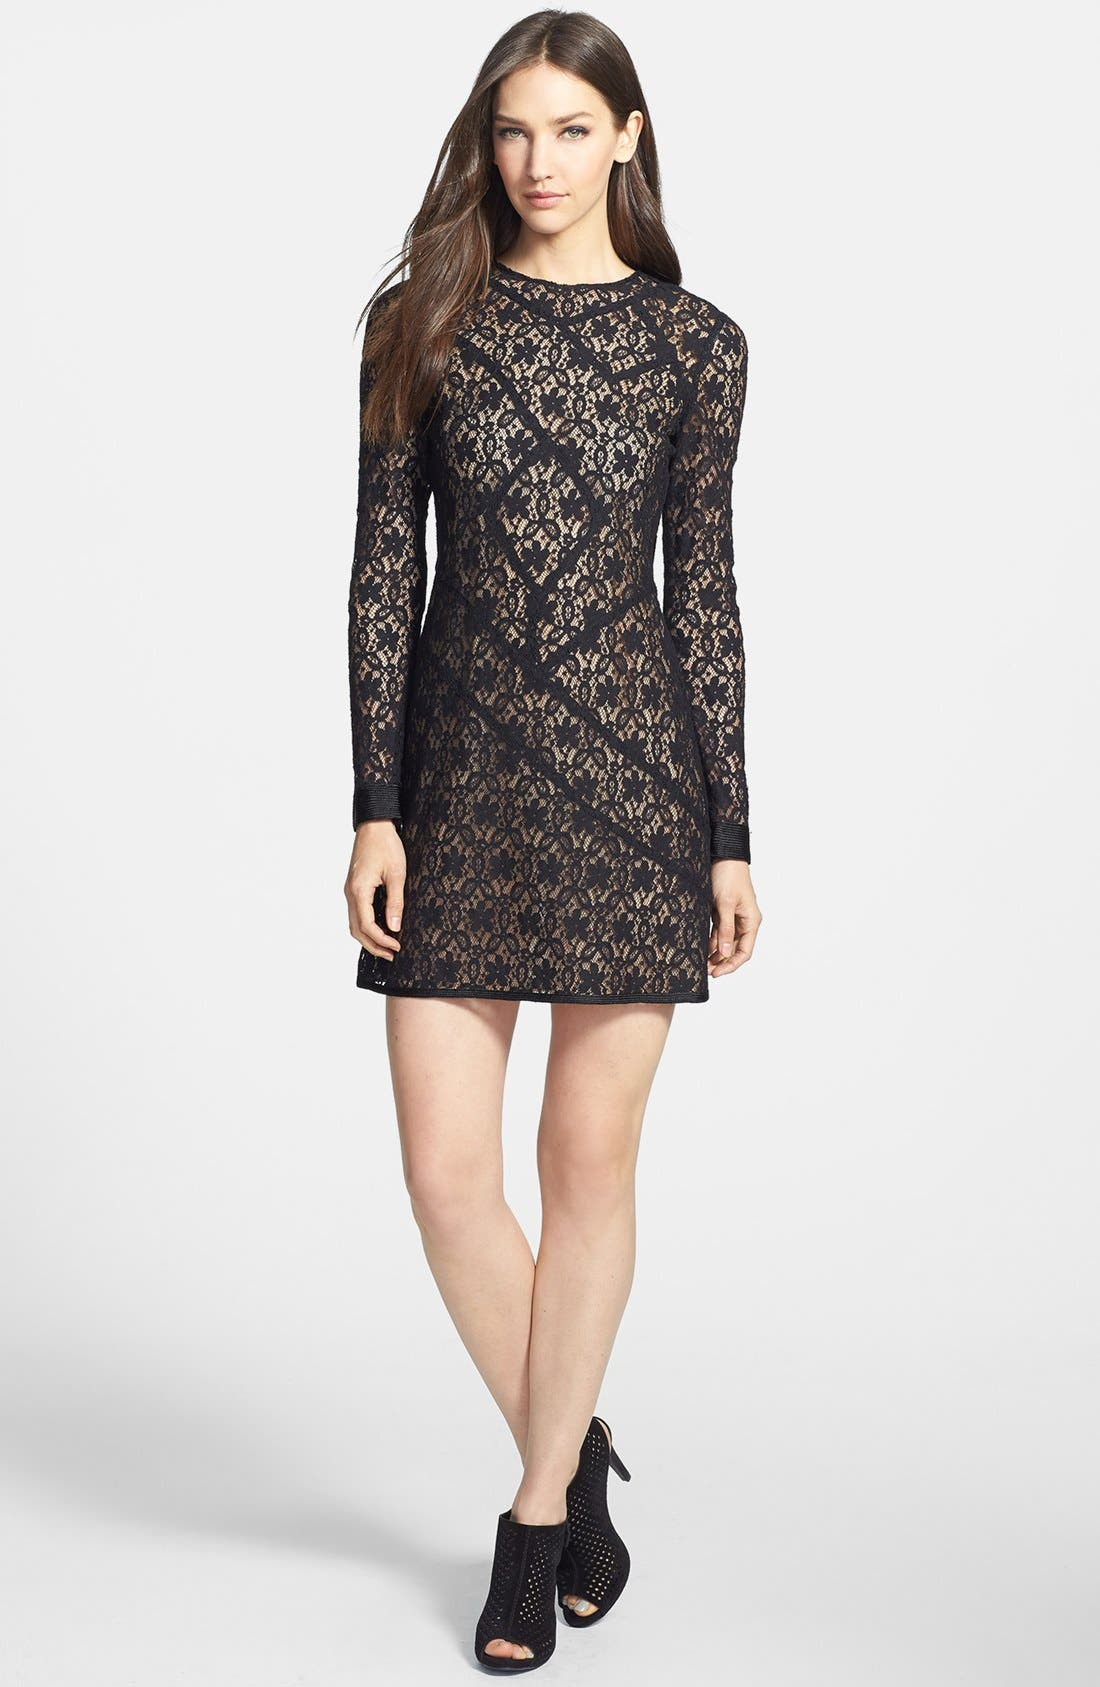 Main Image - MARC BY MARC JACOBS 'Leila' Lace A-Line Dress